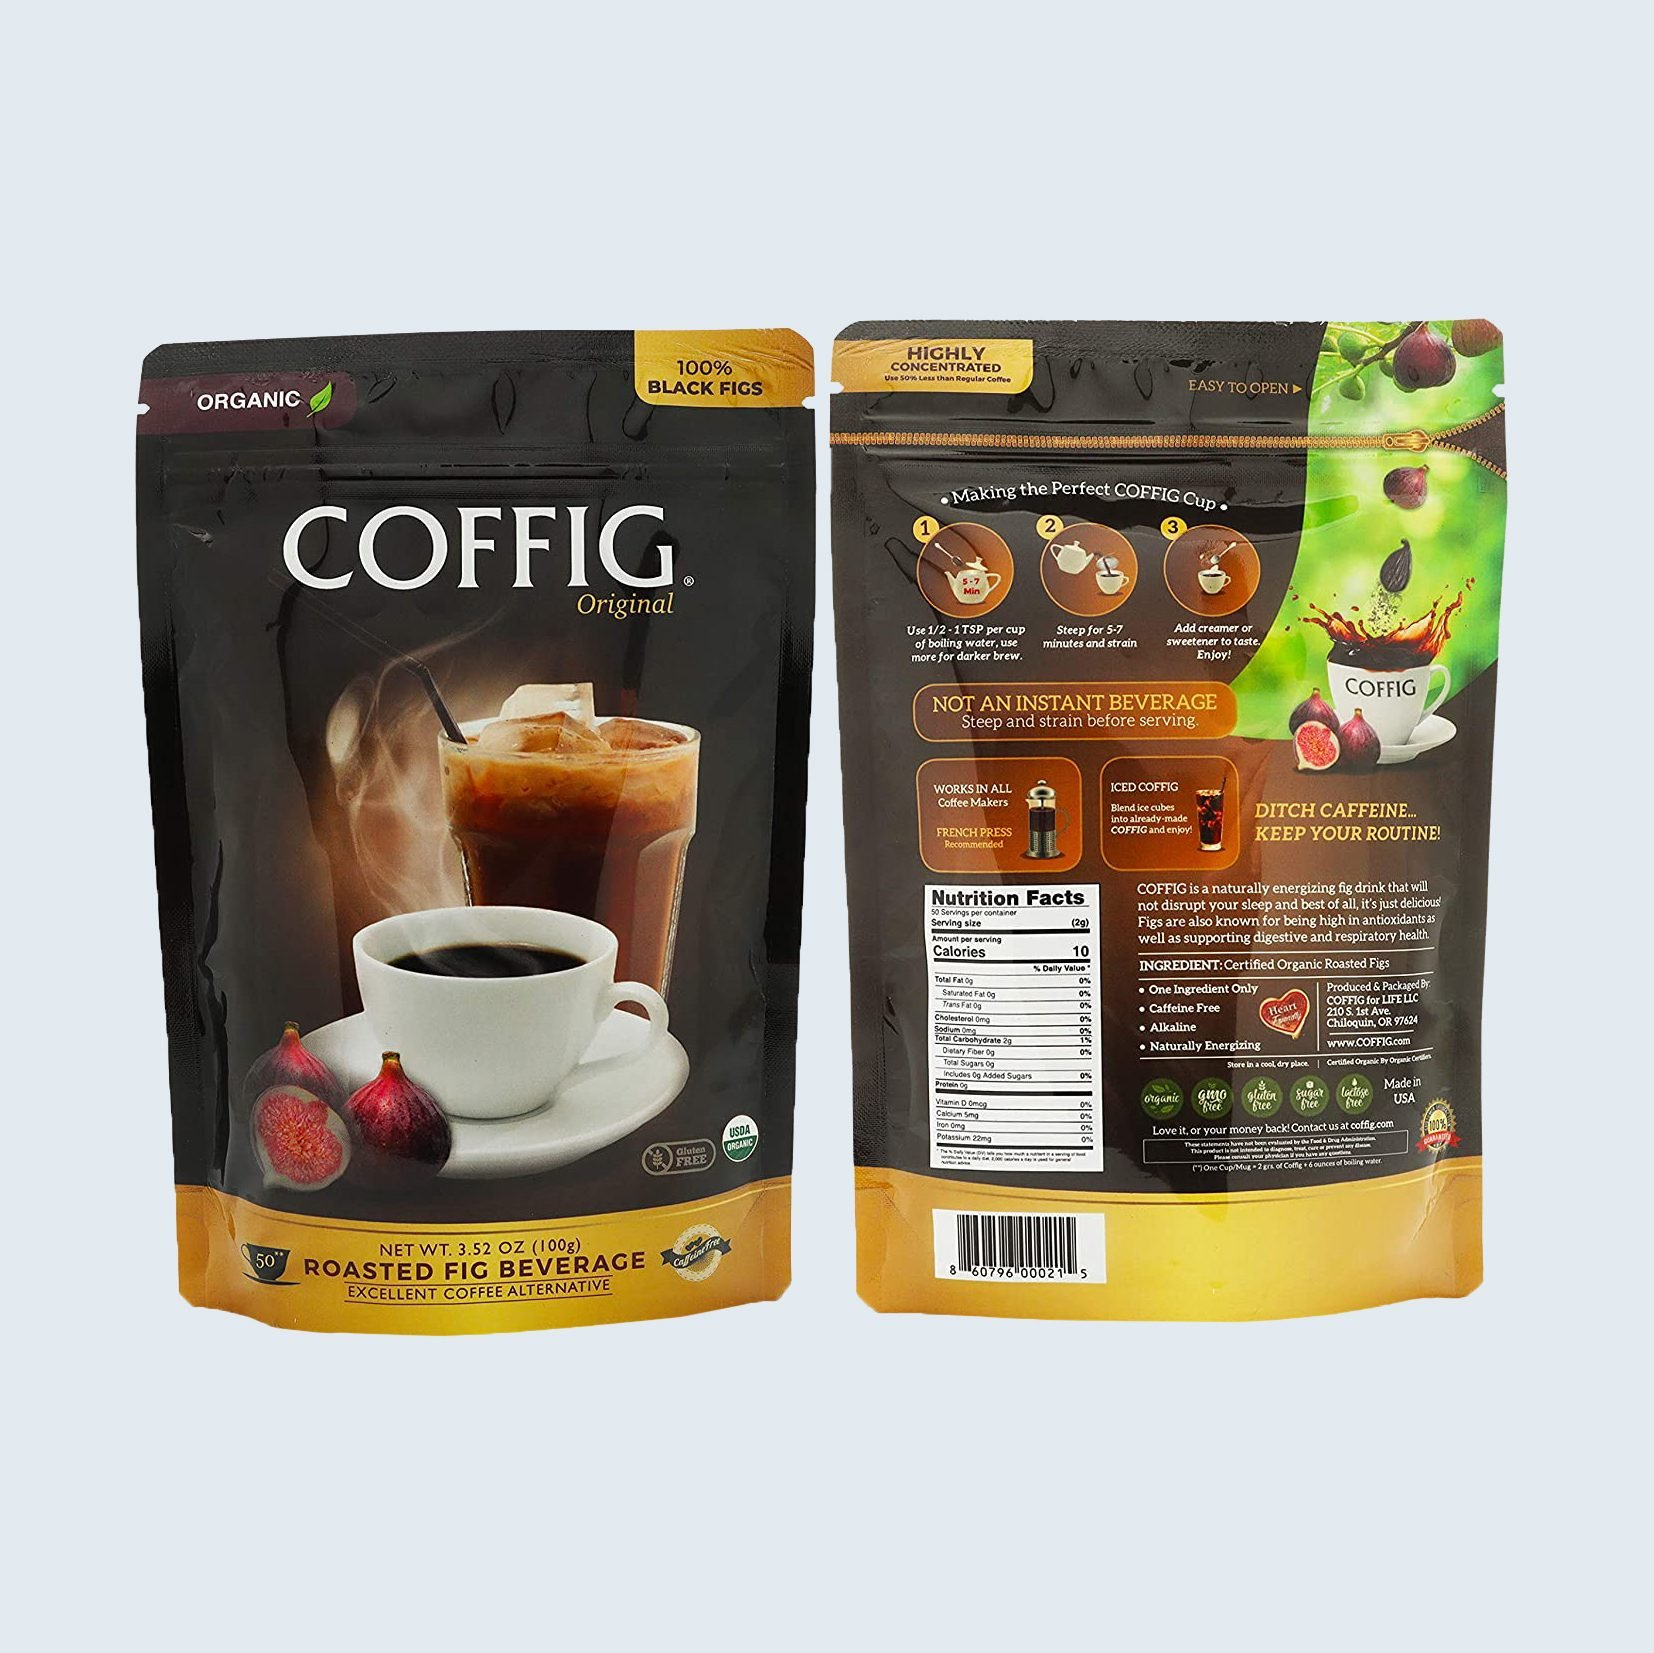 Coffig Roasted Fig Beverage, Coffee Substitute